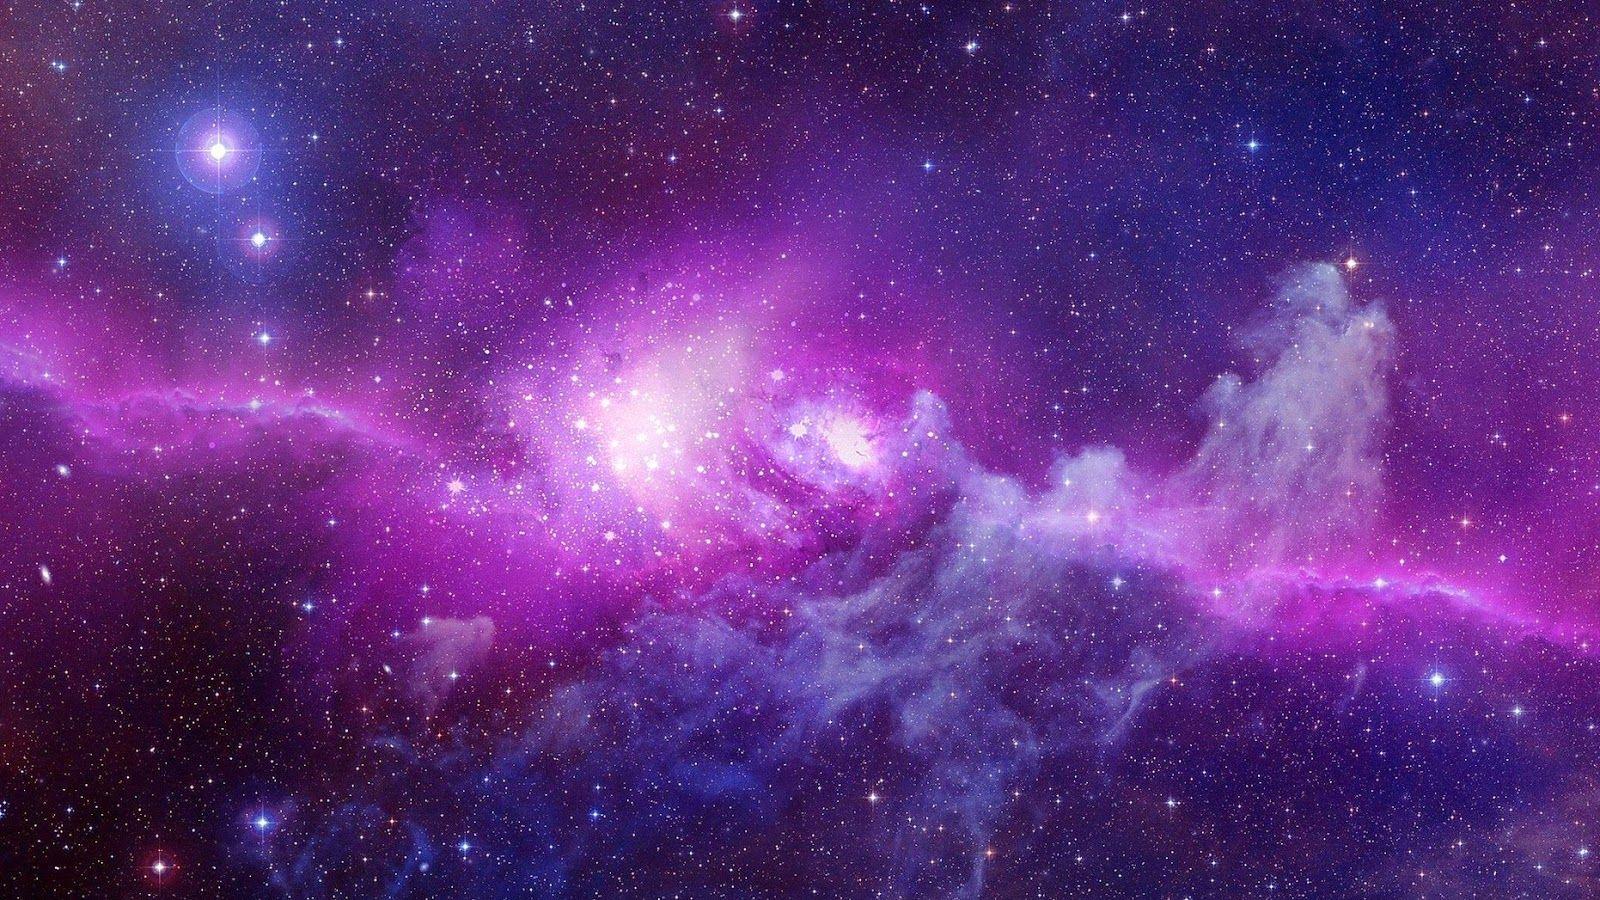 Galaxy Wallpaper Free Download Galaxy Violet Wallpaper Purple Galaxy Wallpaper Hd Galaxy Wallpaper Galaxy Wallpaper